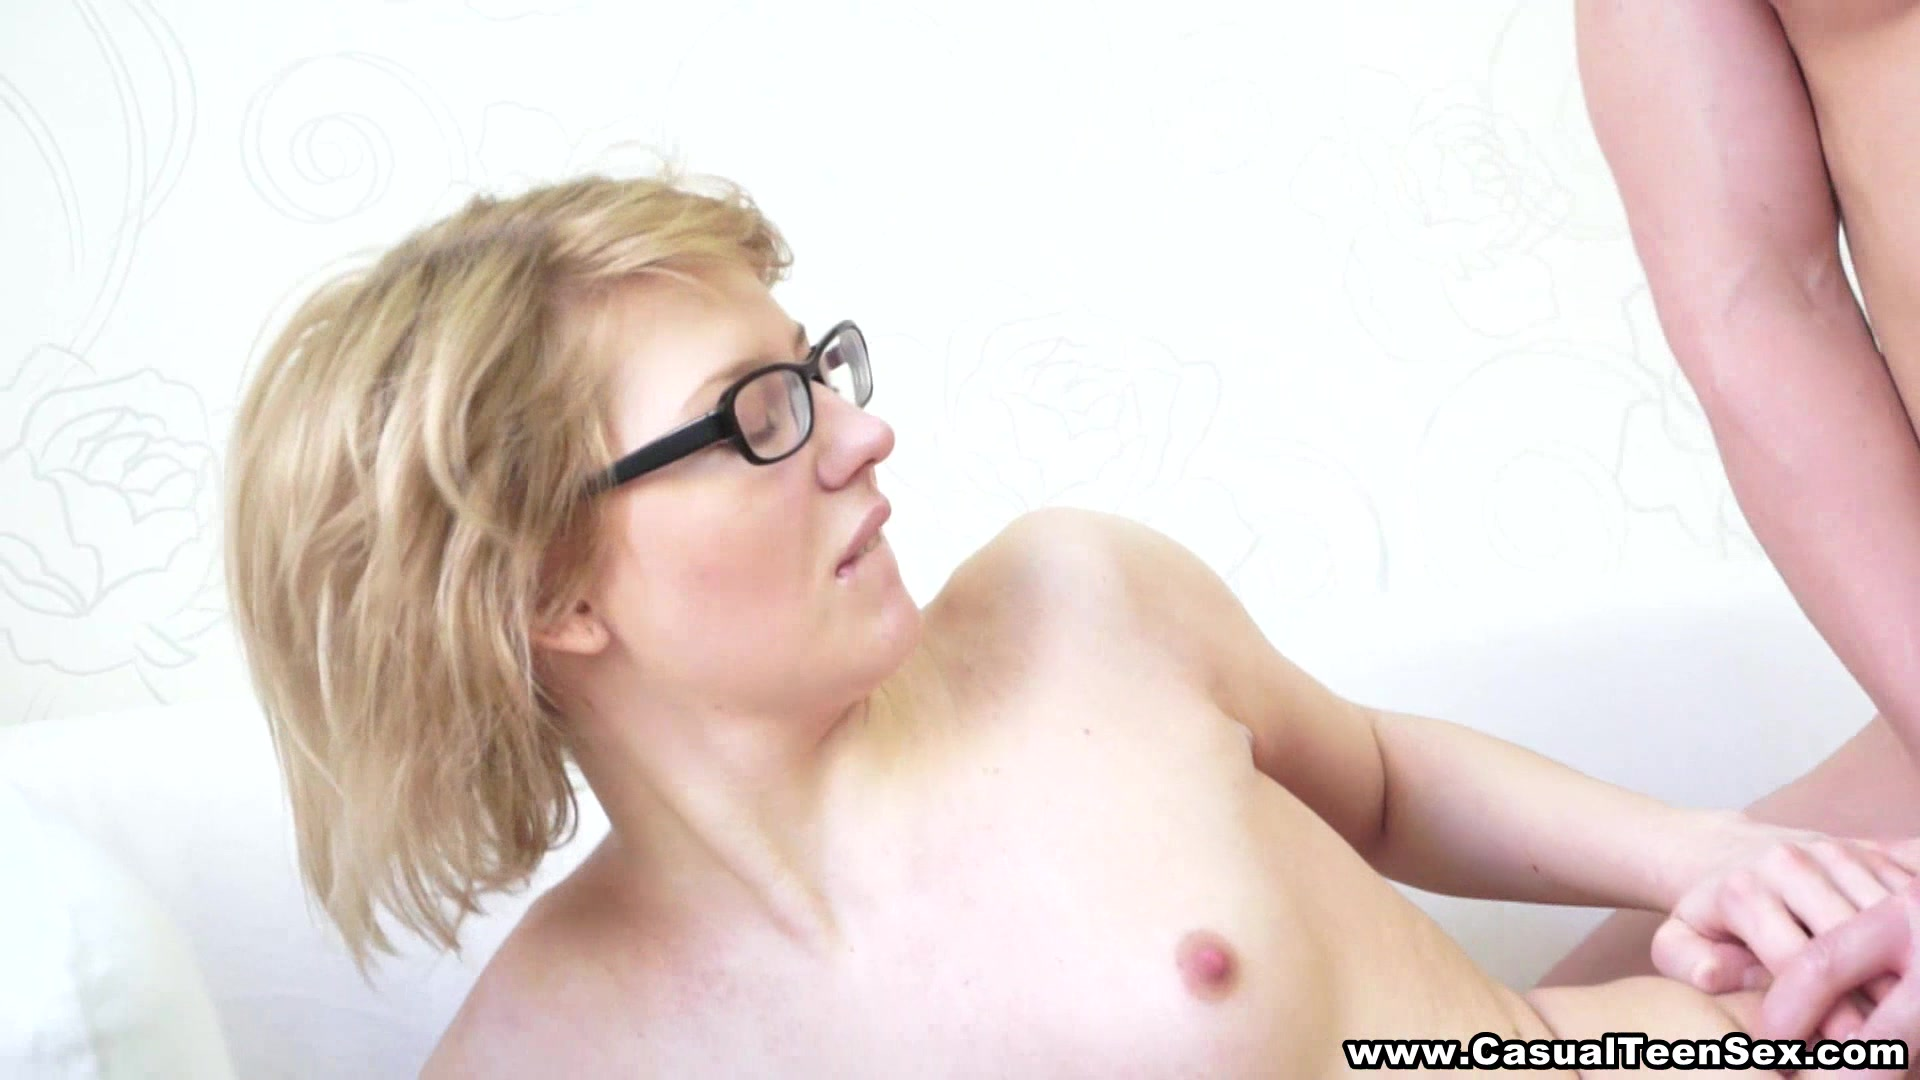 spalding baseball bat dating Sex photo